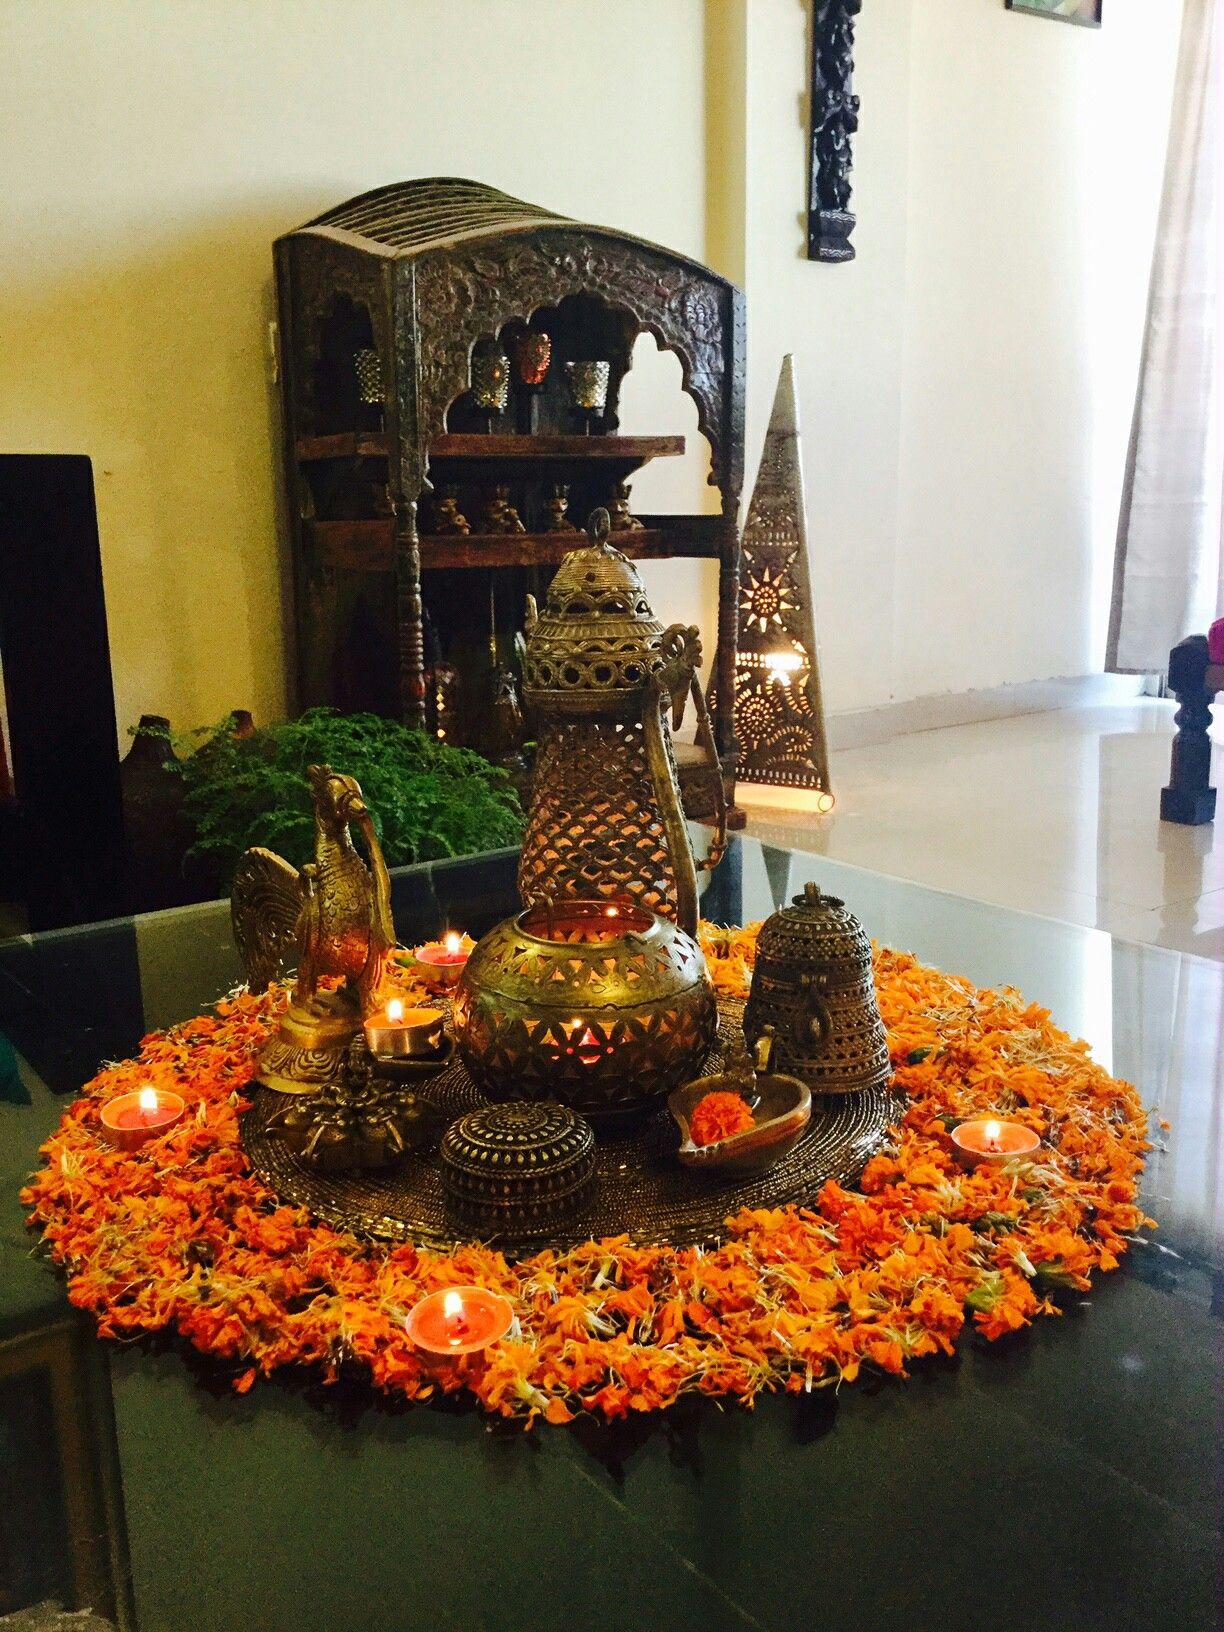 Diwali Decor My Home Diwali Decorations Decor Indian Home Decor